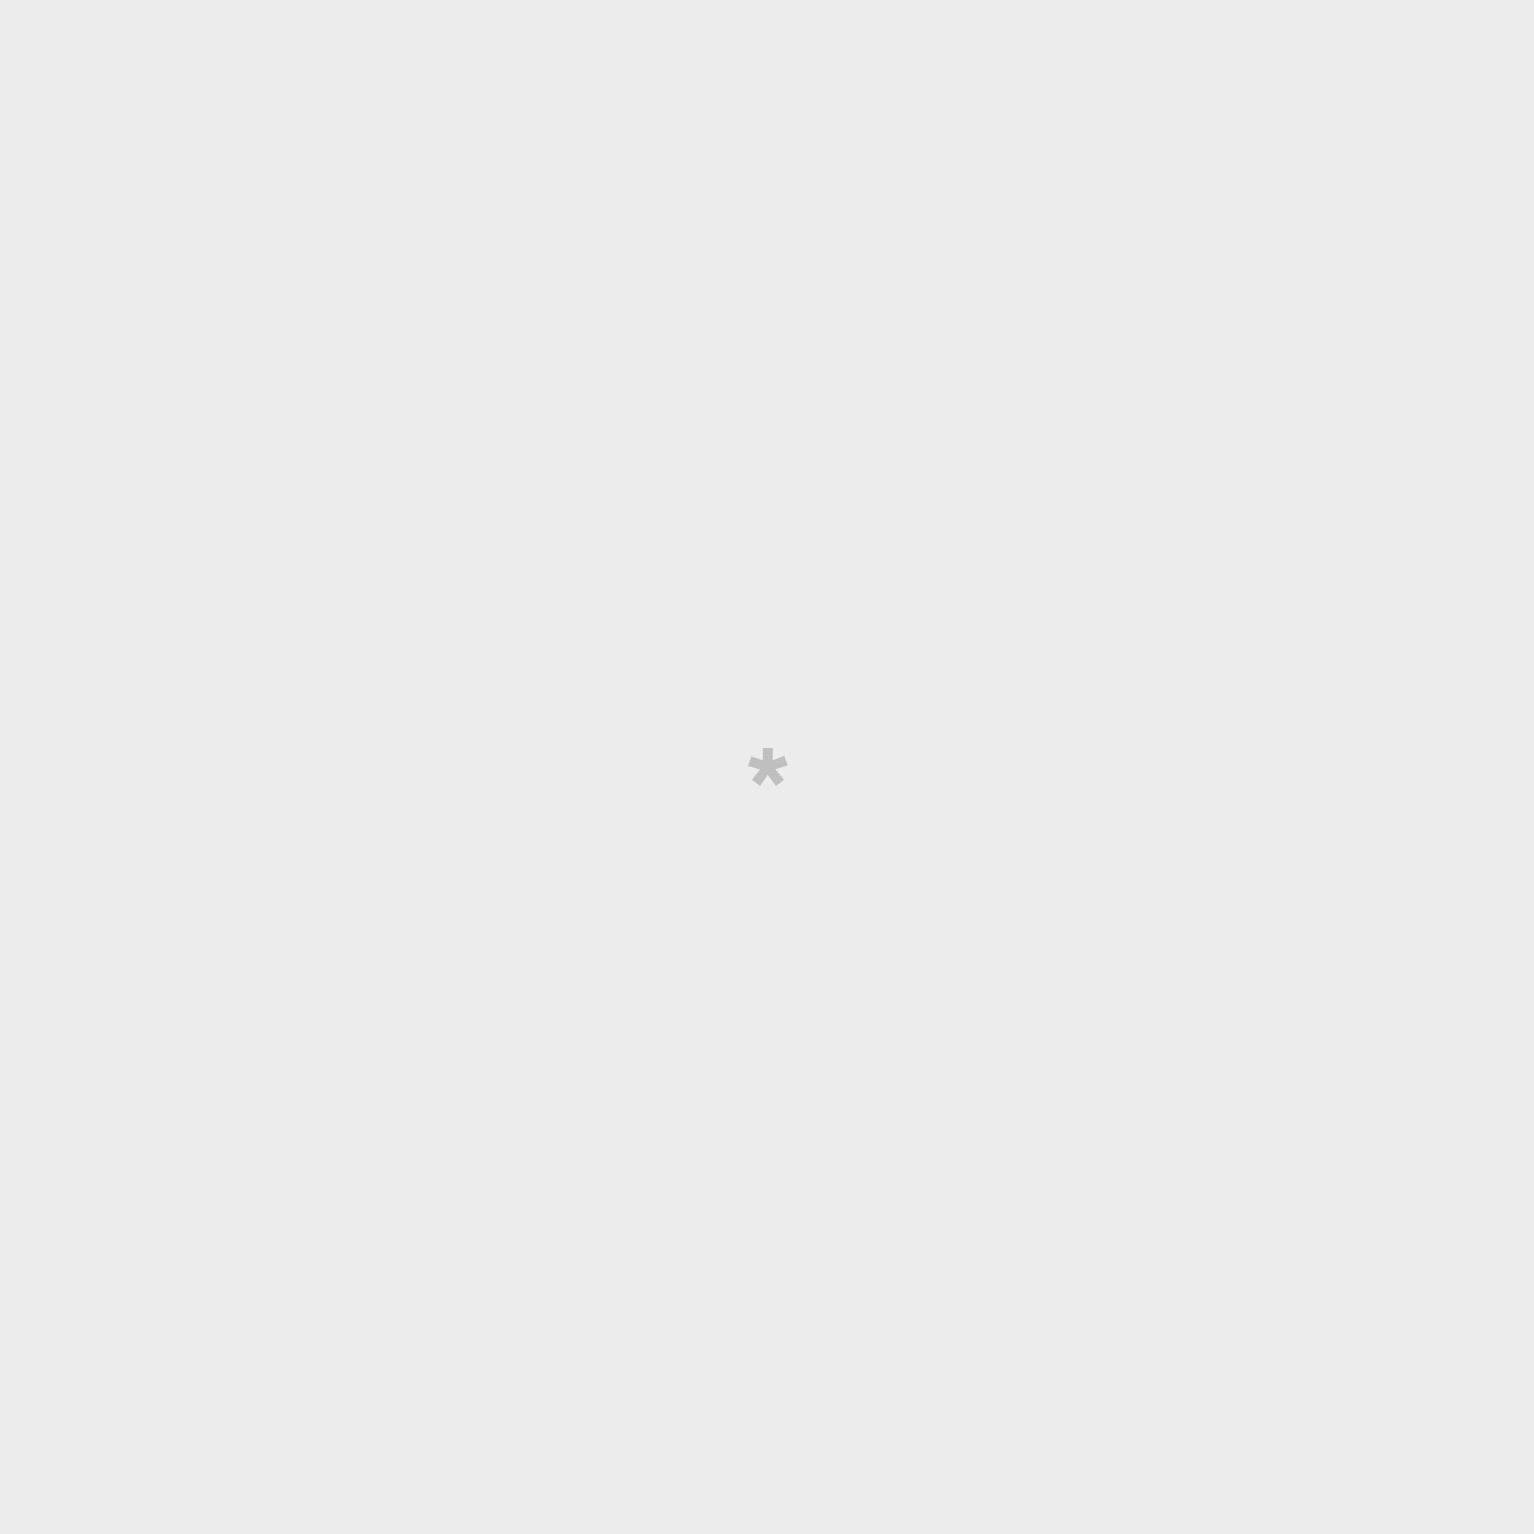 Set de 10 bolsas para crear el kit de supervivencia ideal